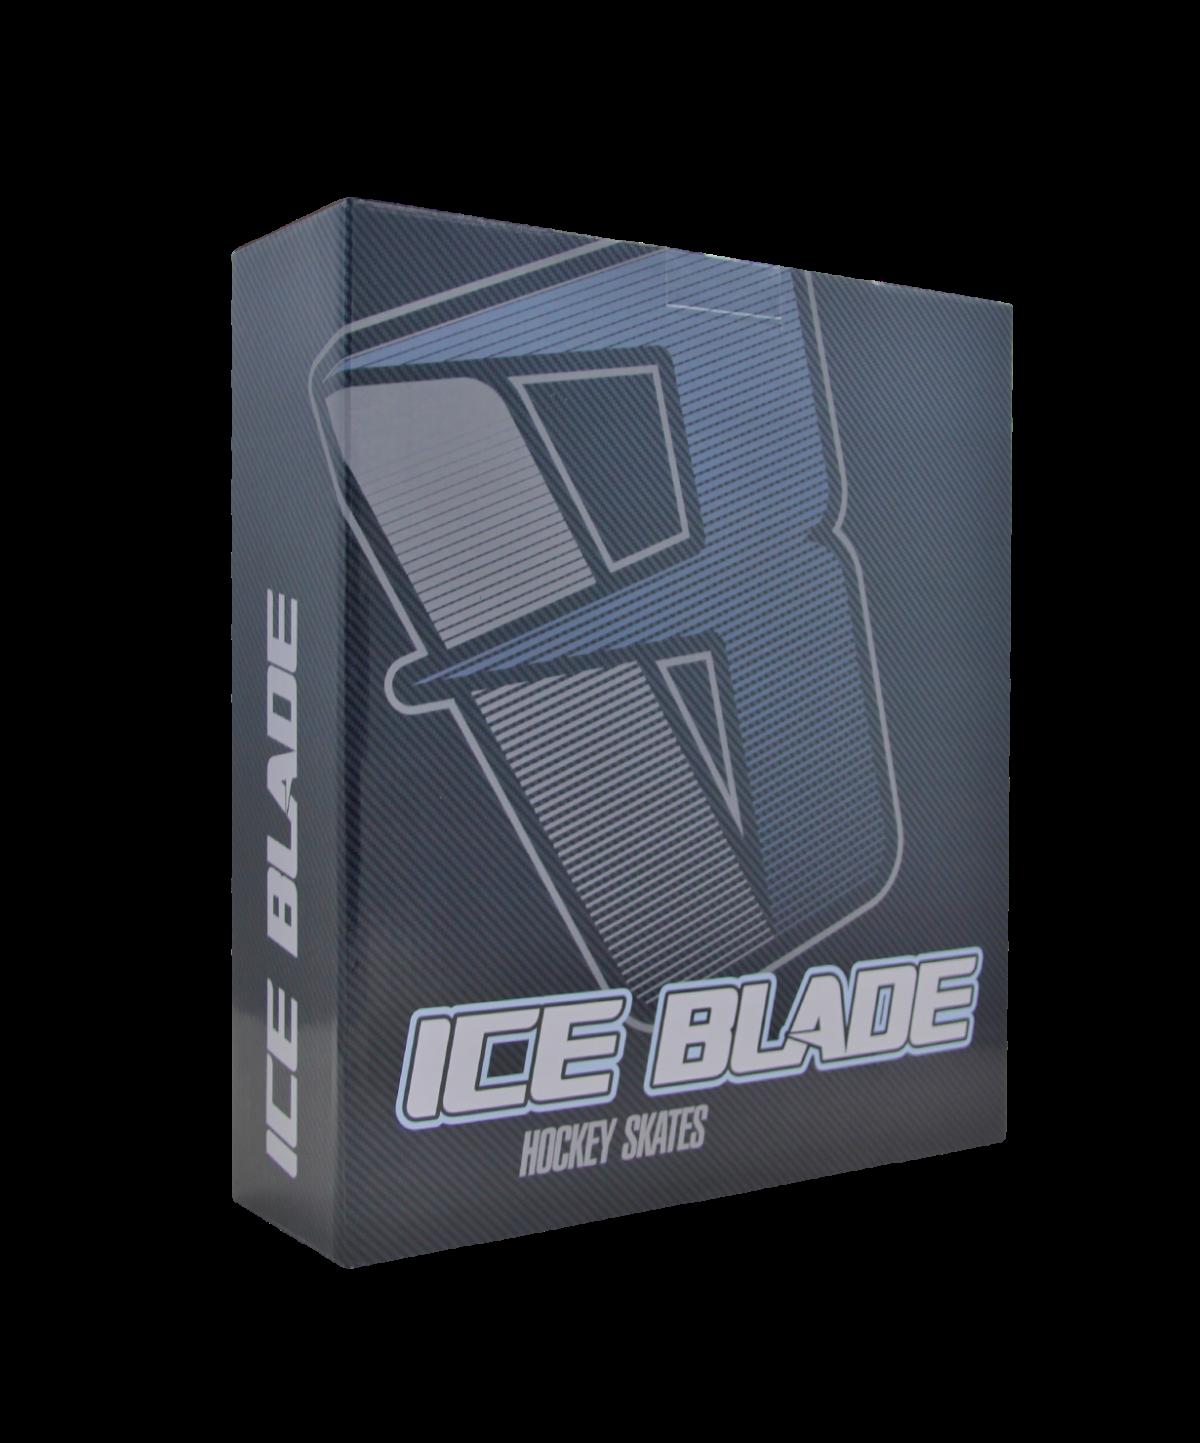 ICE BLADE Коньки хоккейные Vortex V110 - 3